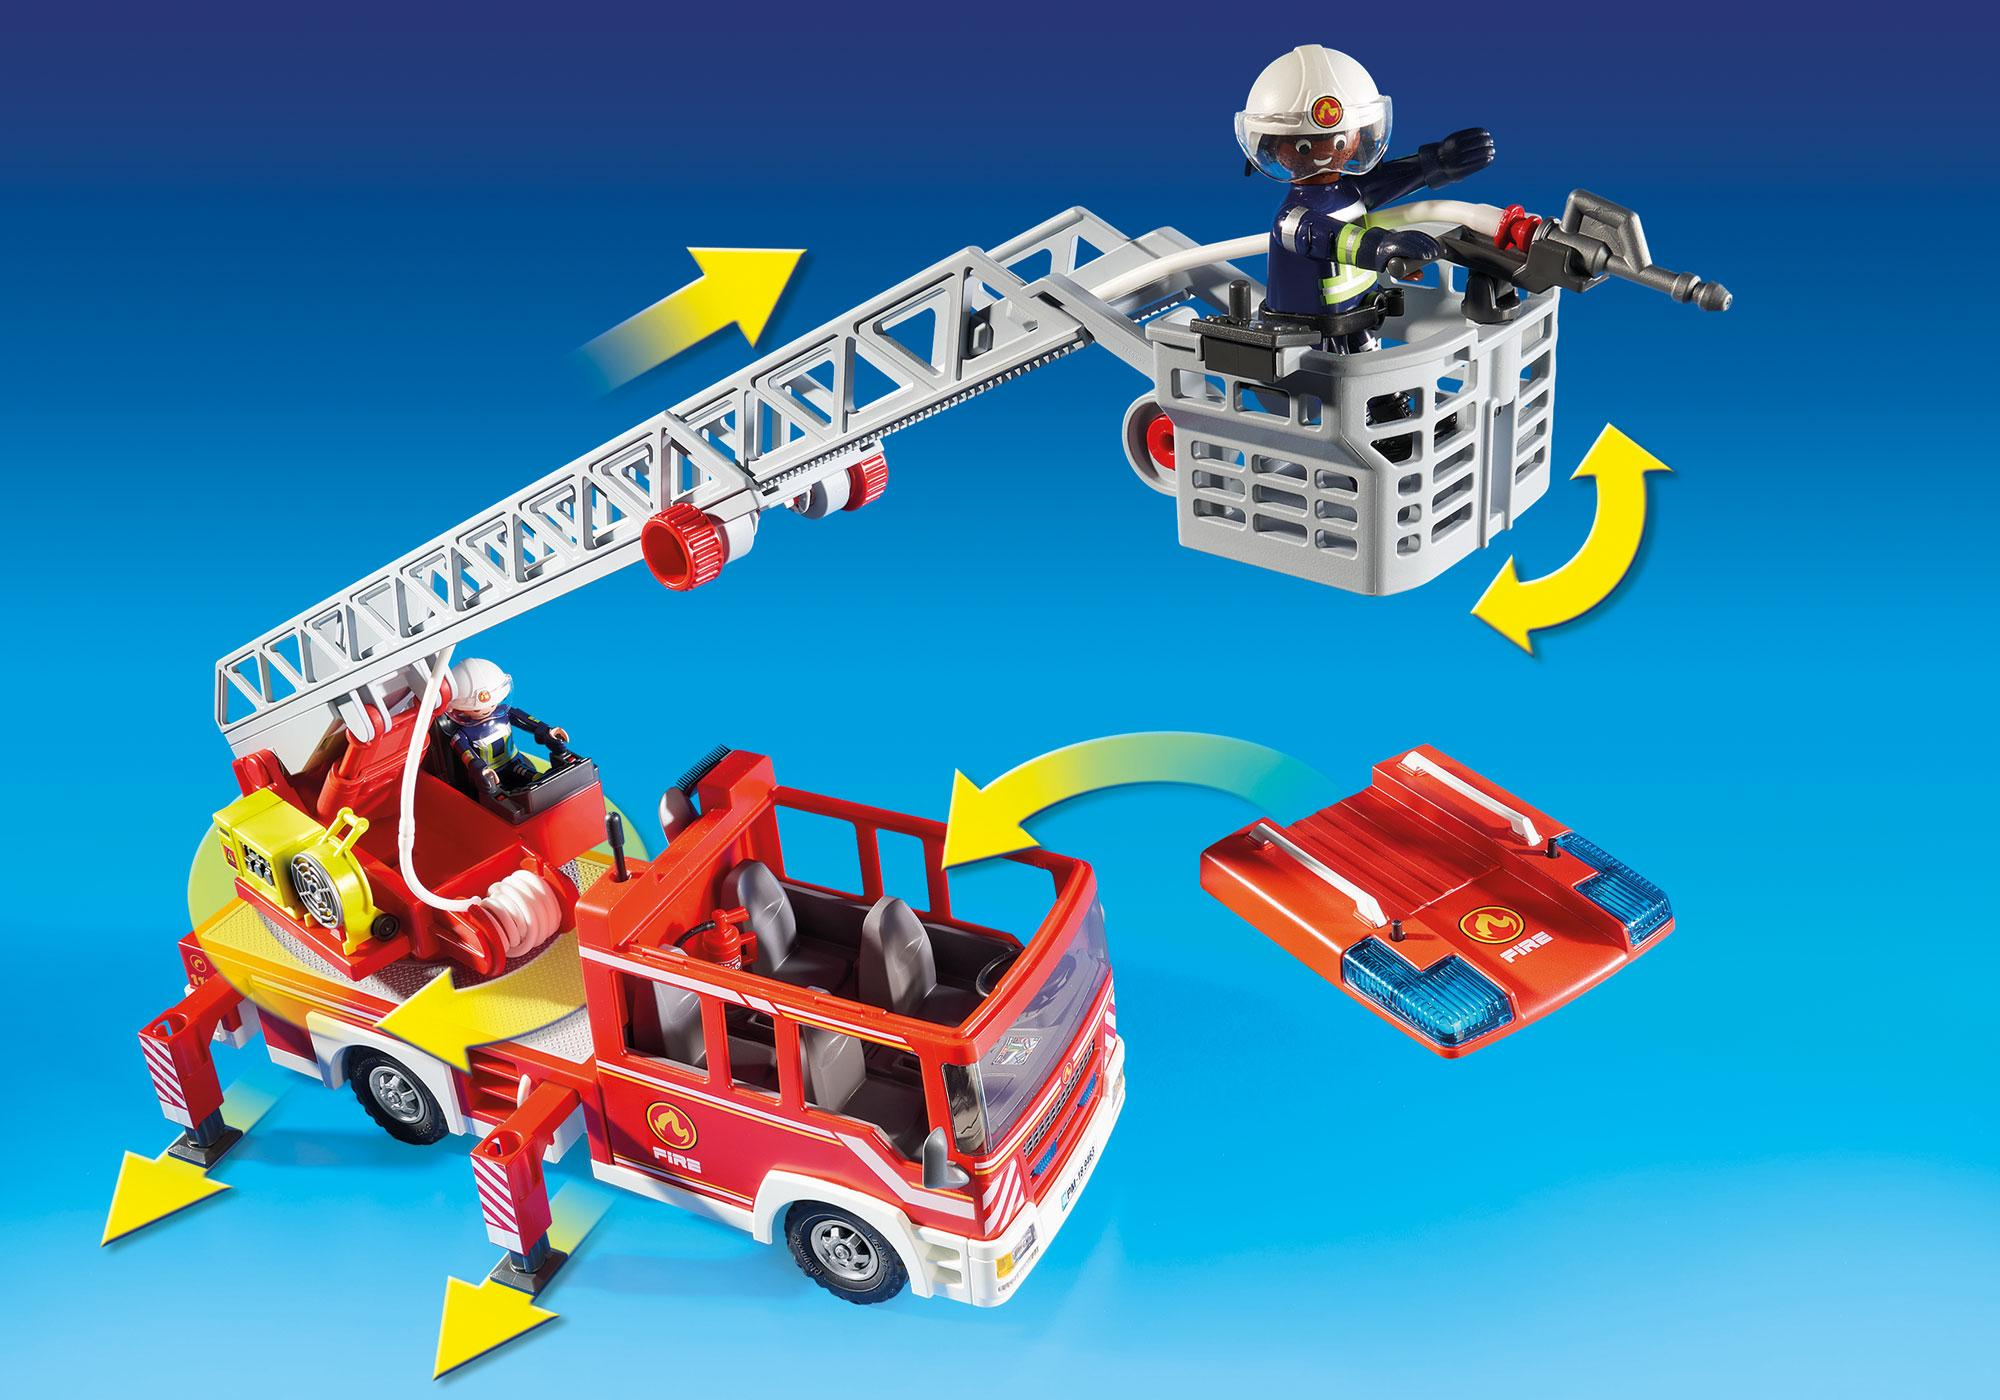 http://media.playmobil.com/i/playmobil/9463_product_extra3/Samochód strażacki z drabiną